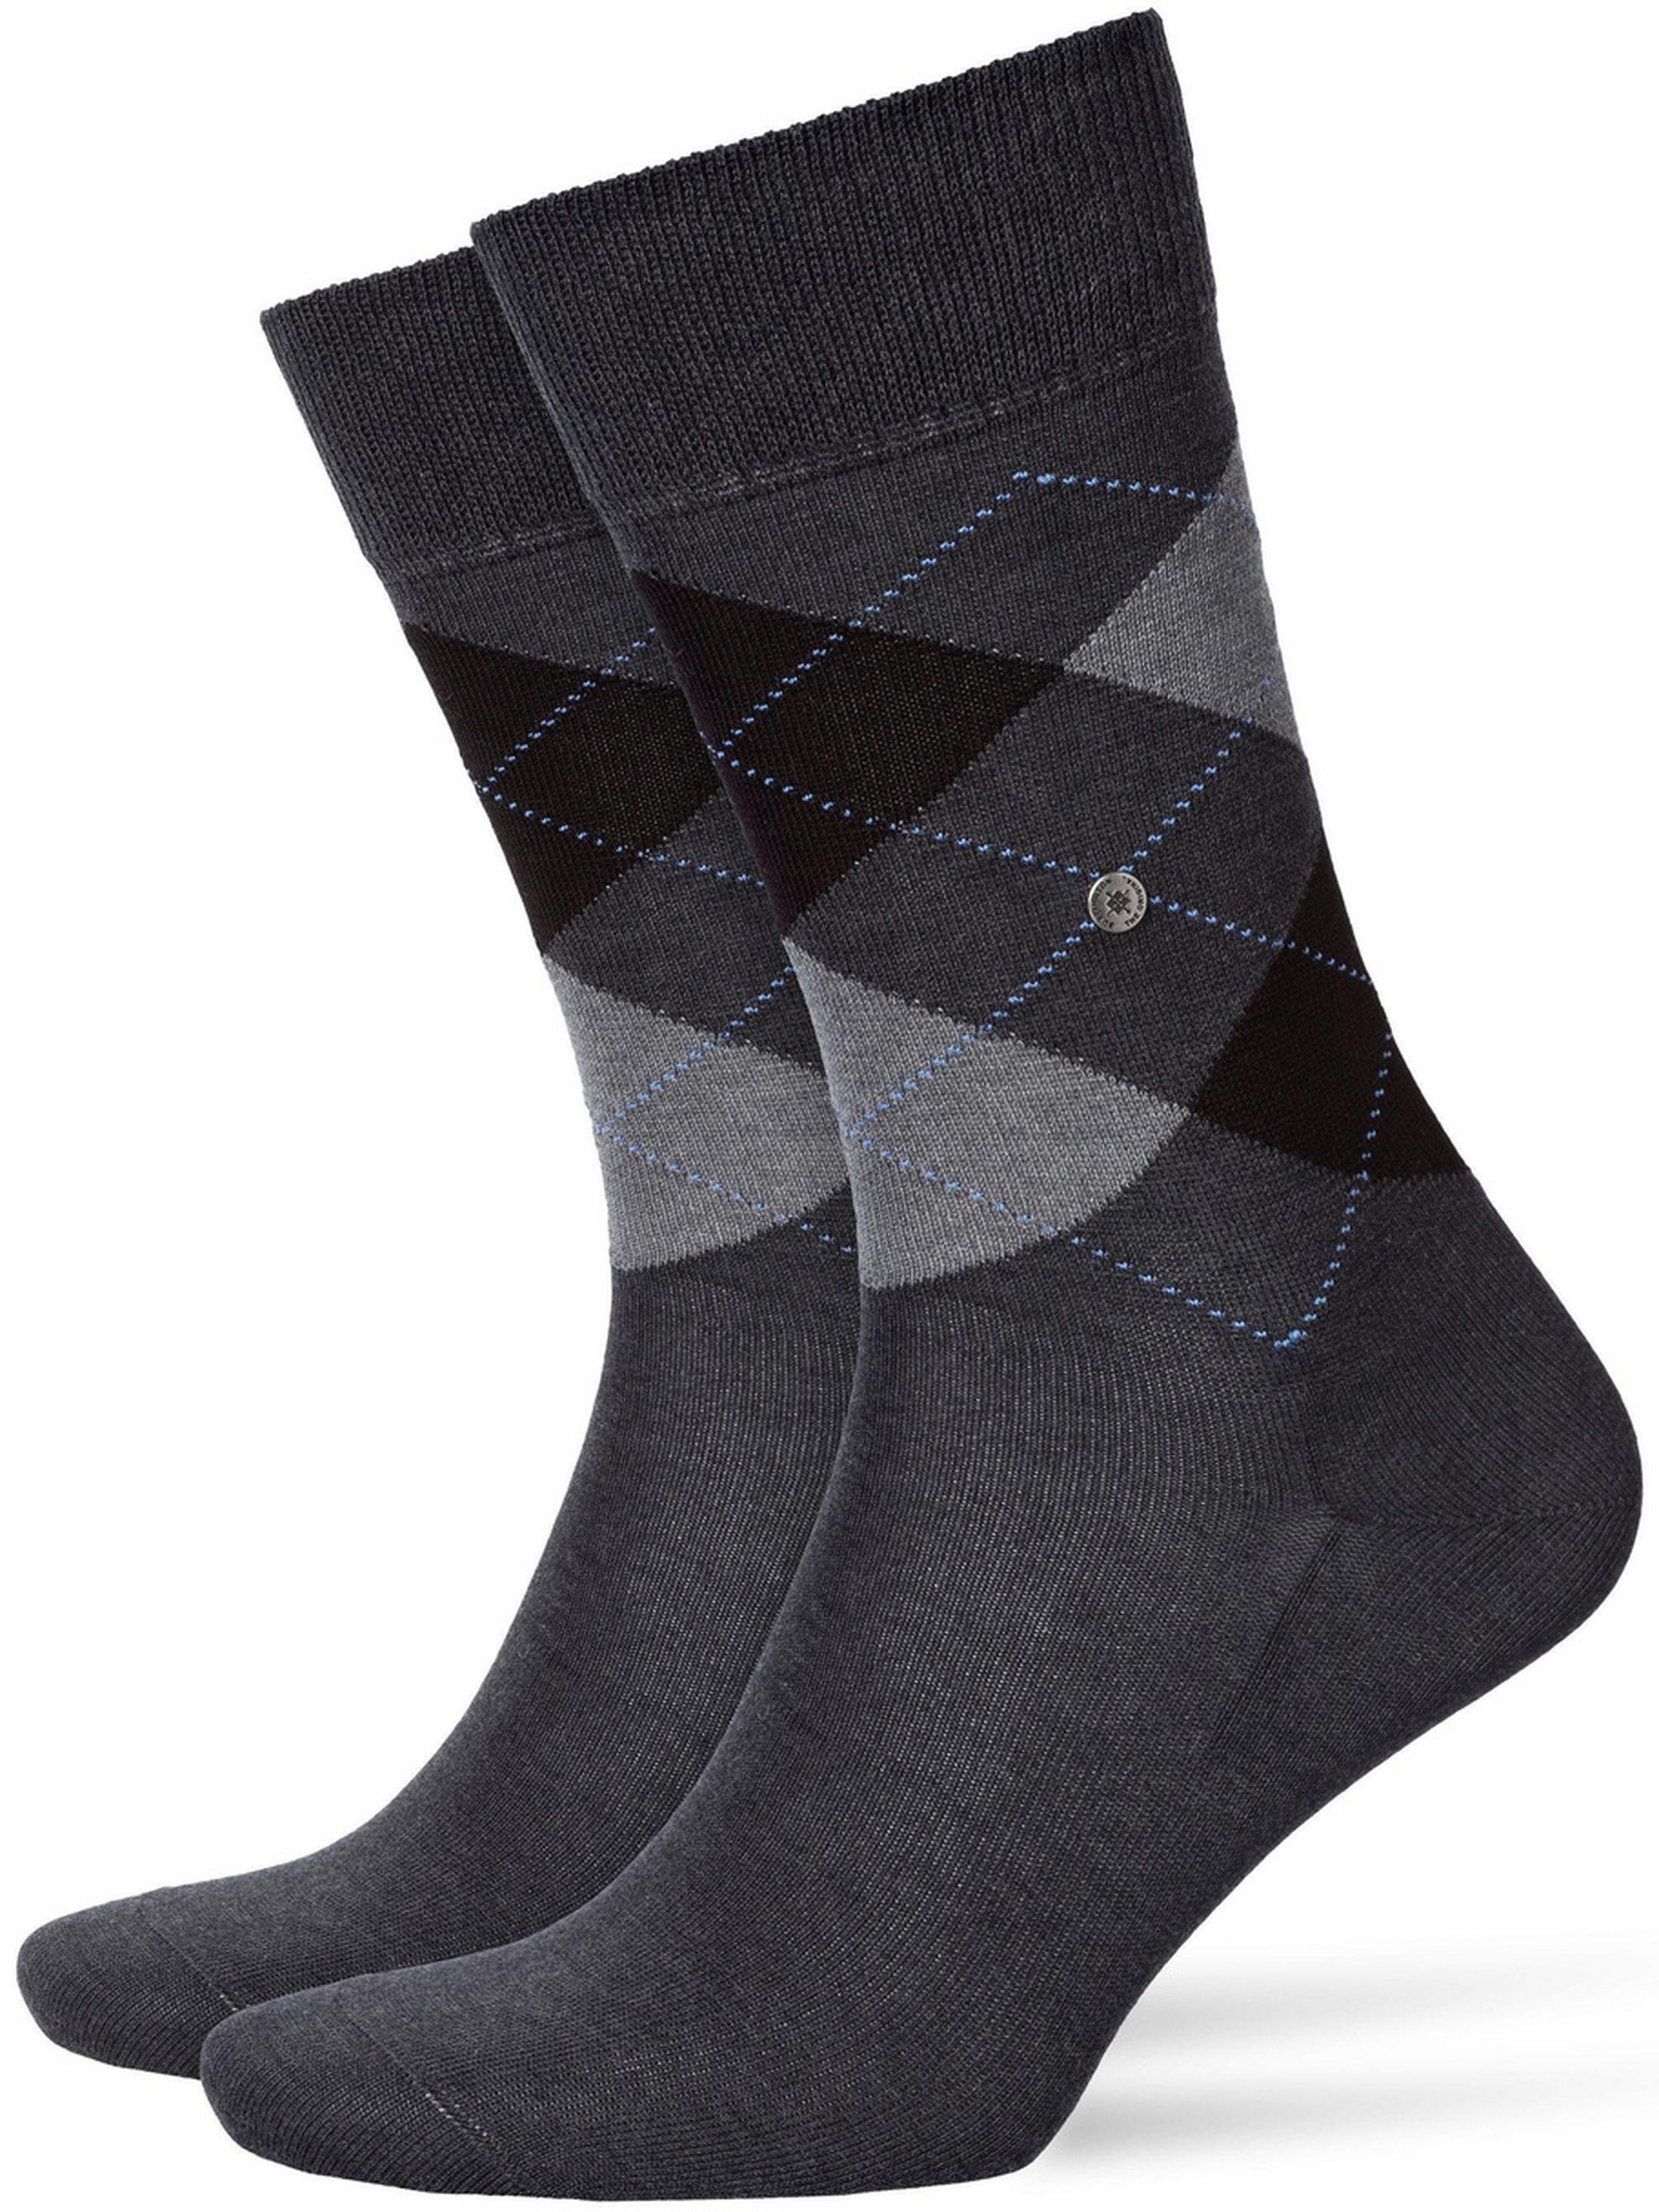 Burlington Socken Kariert Baumwolle 3095